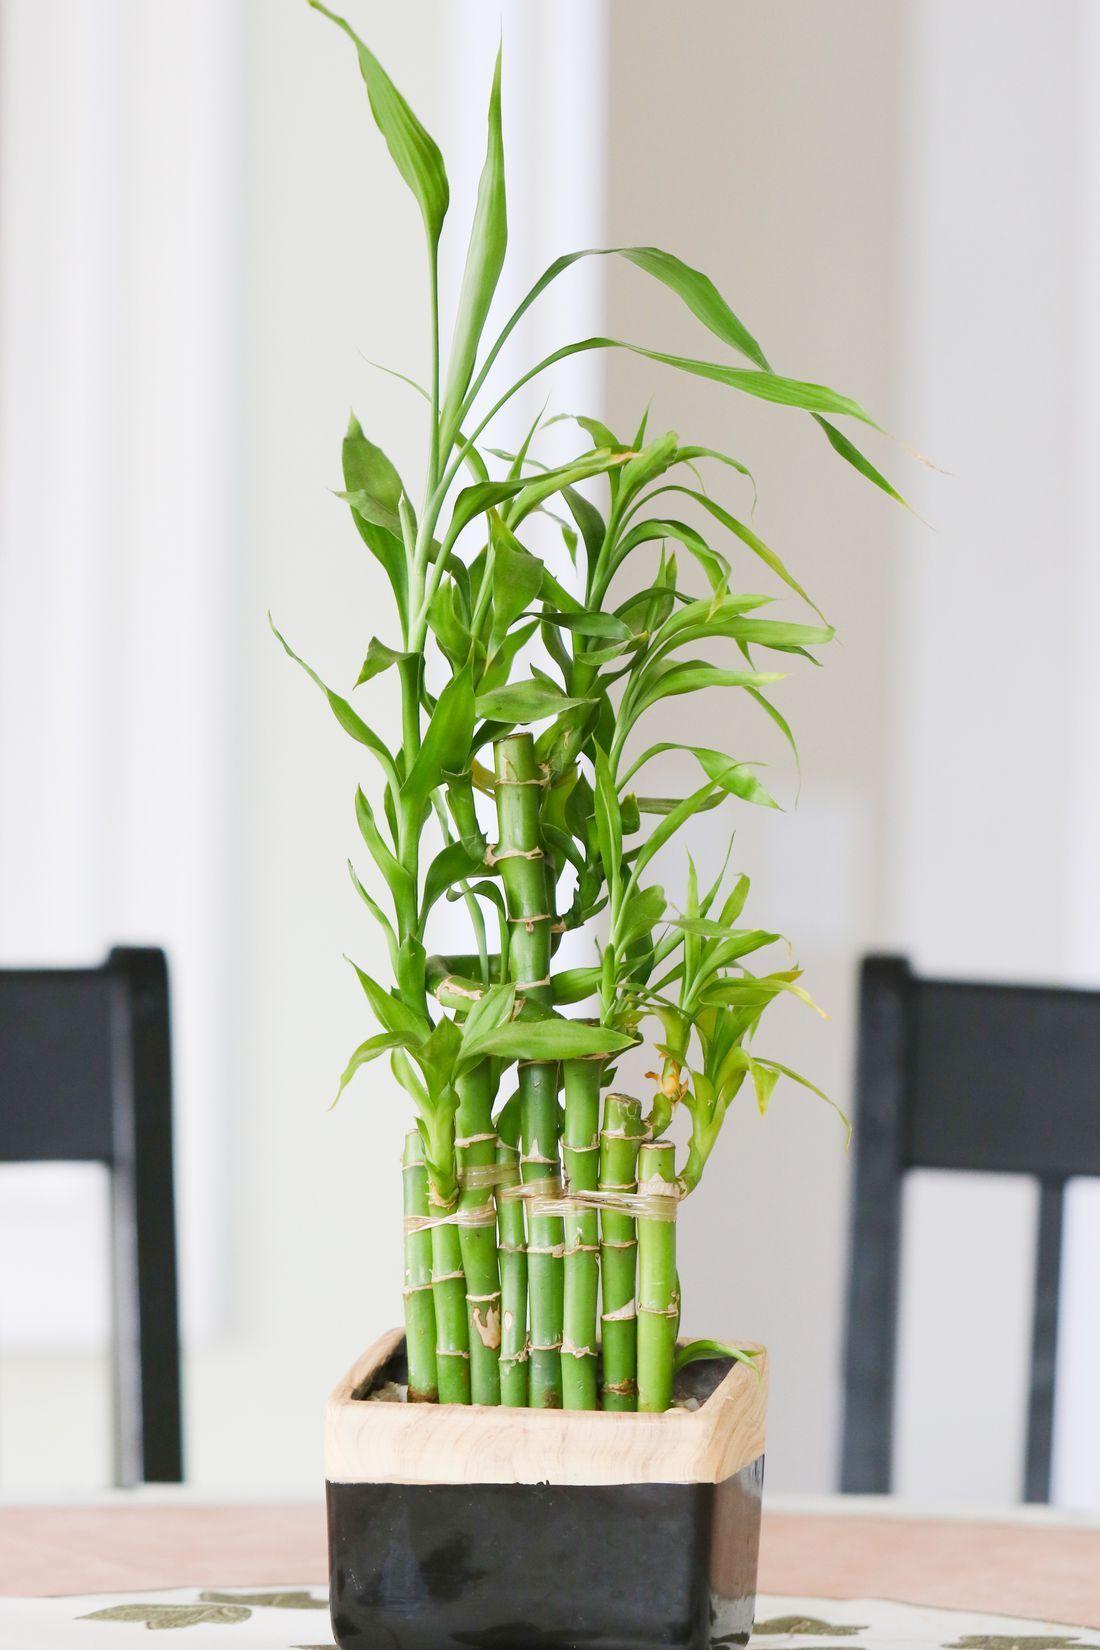 Bamboo plant indoor indoor bamboo plant bamboo plant